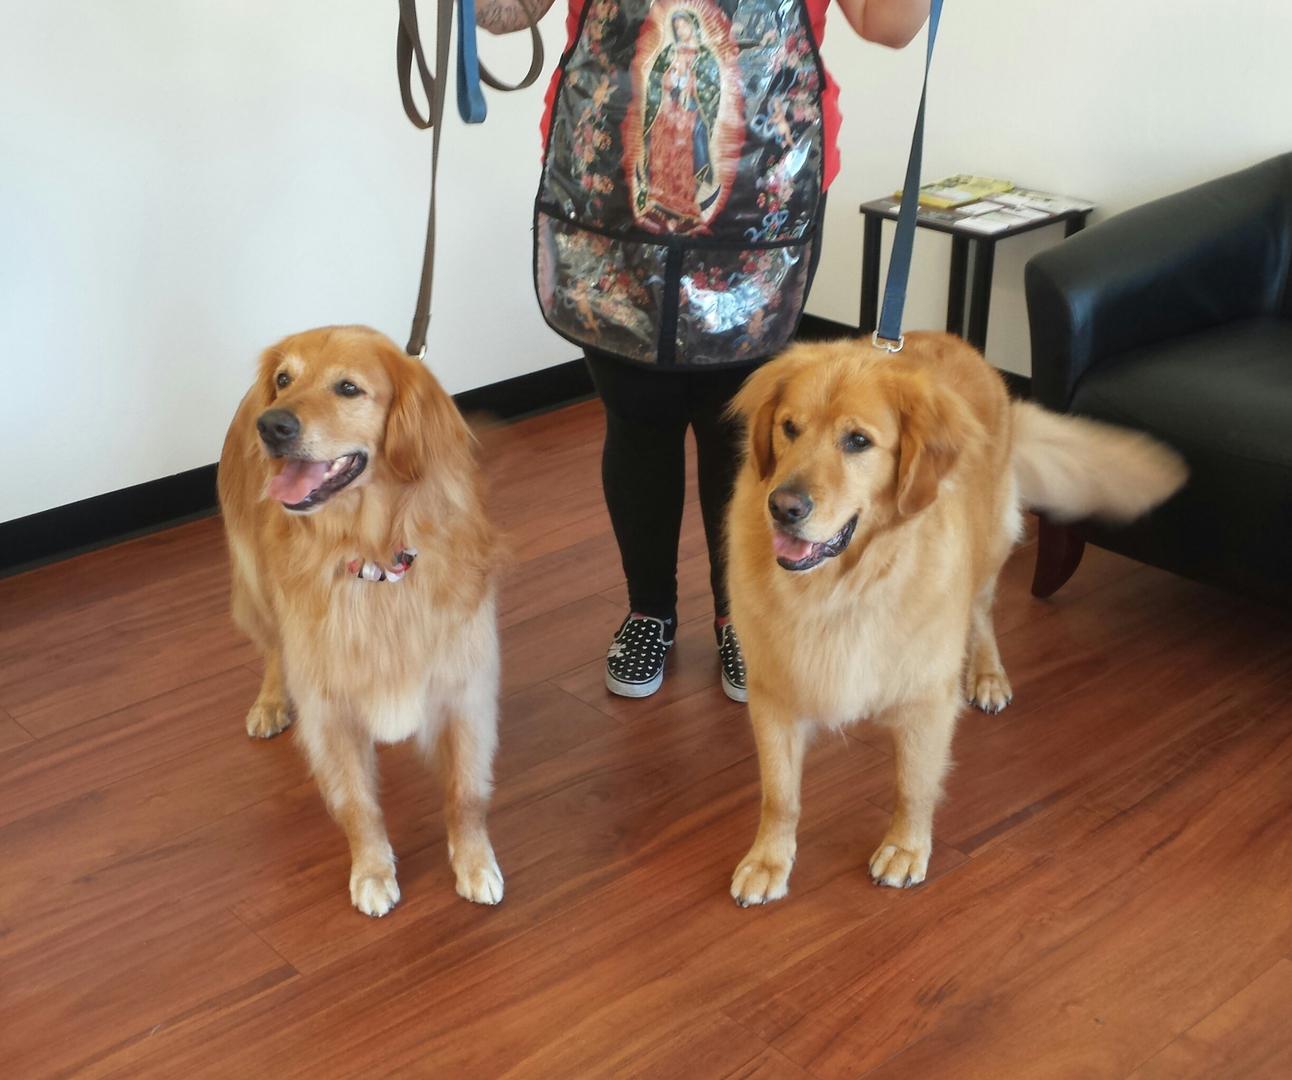 Furry Friends Dog Grooming San Jose